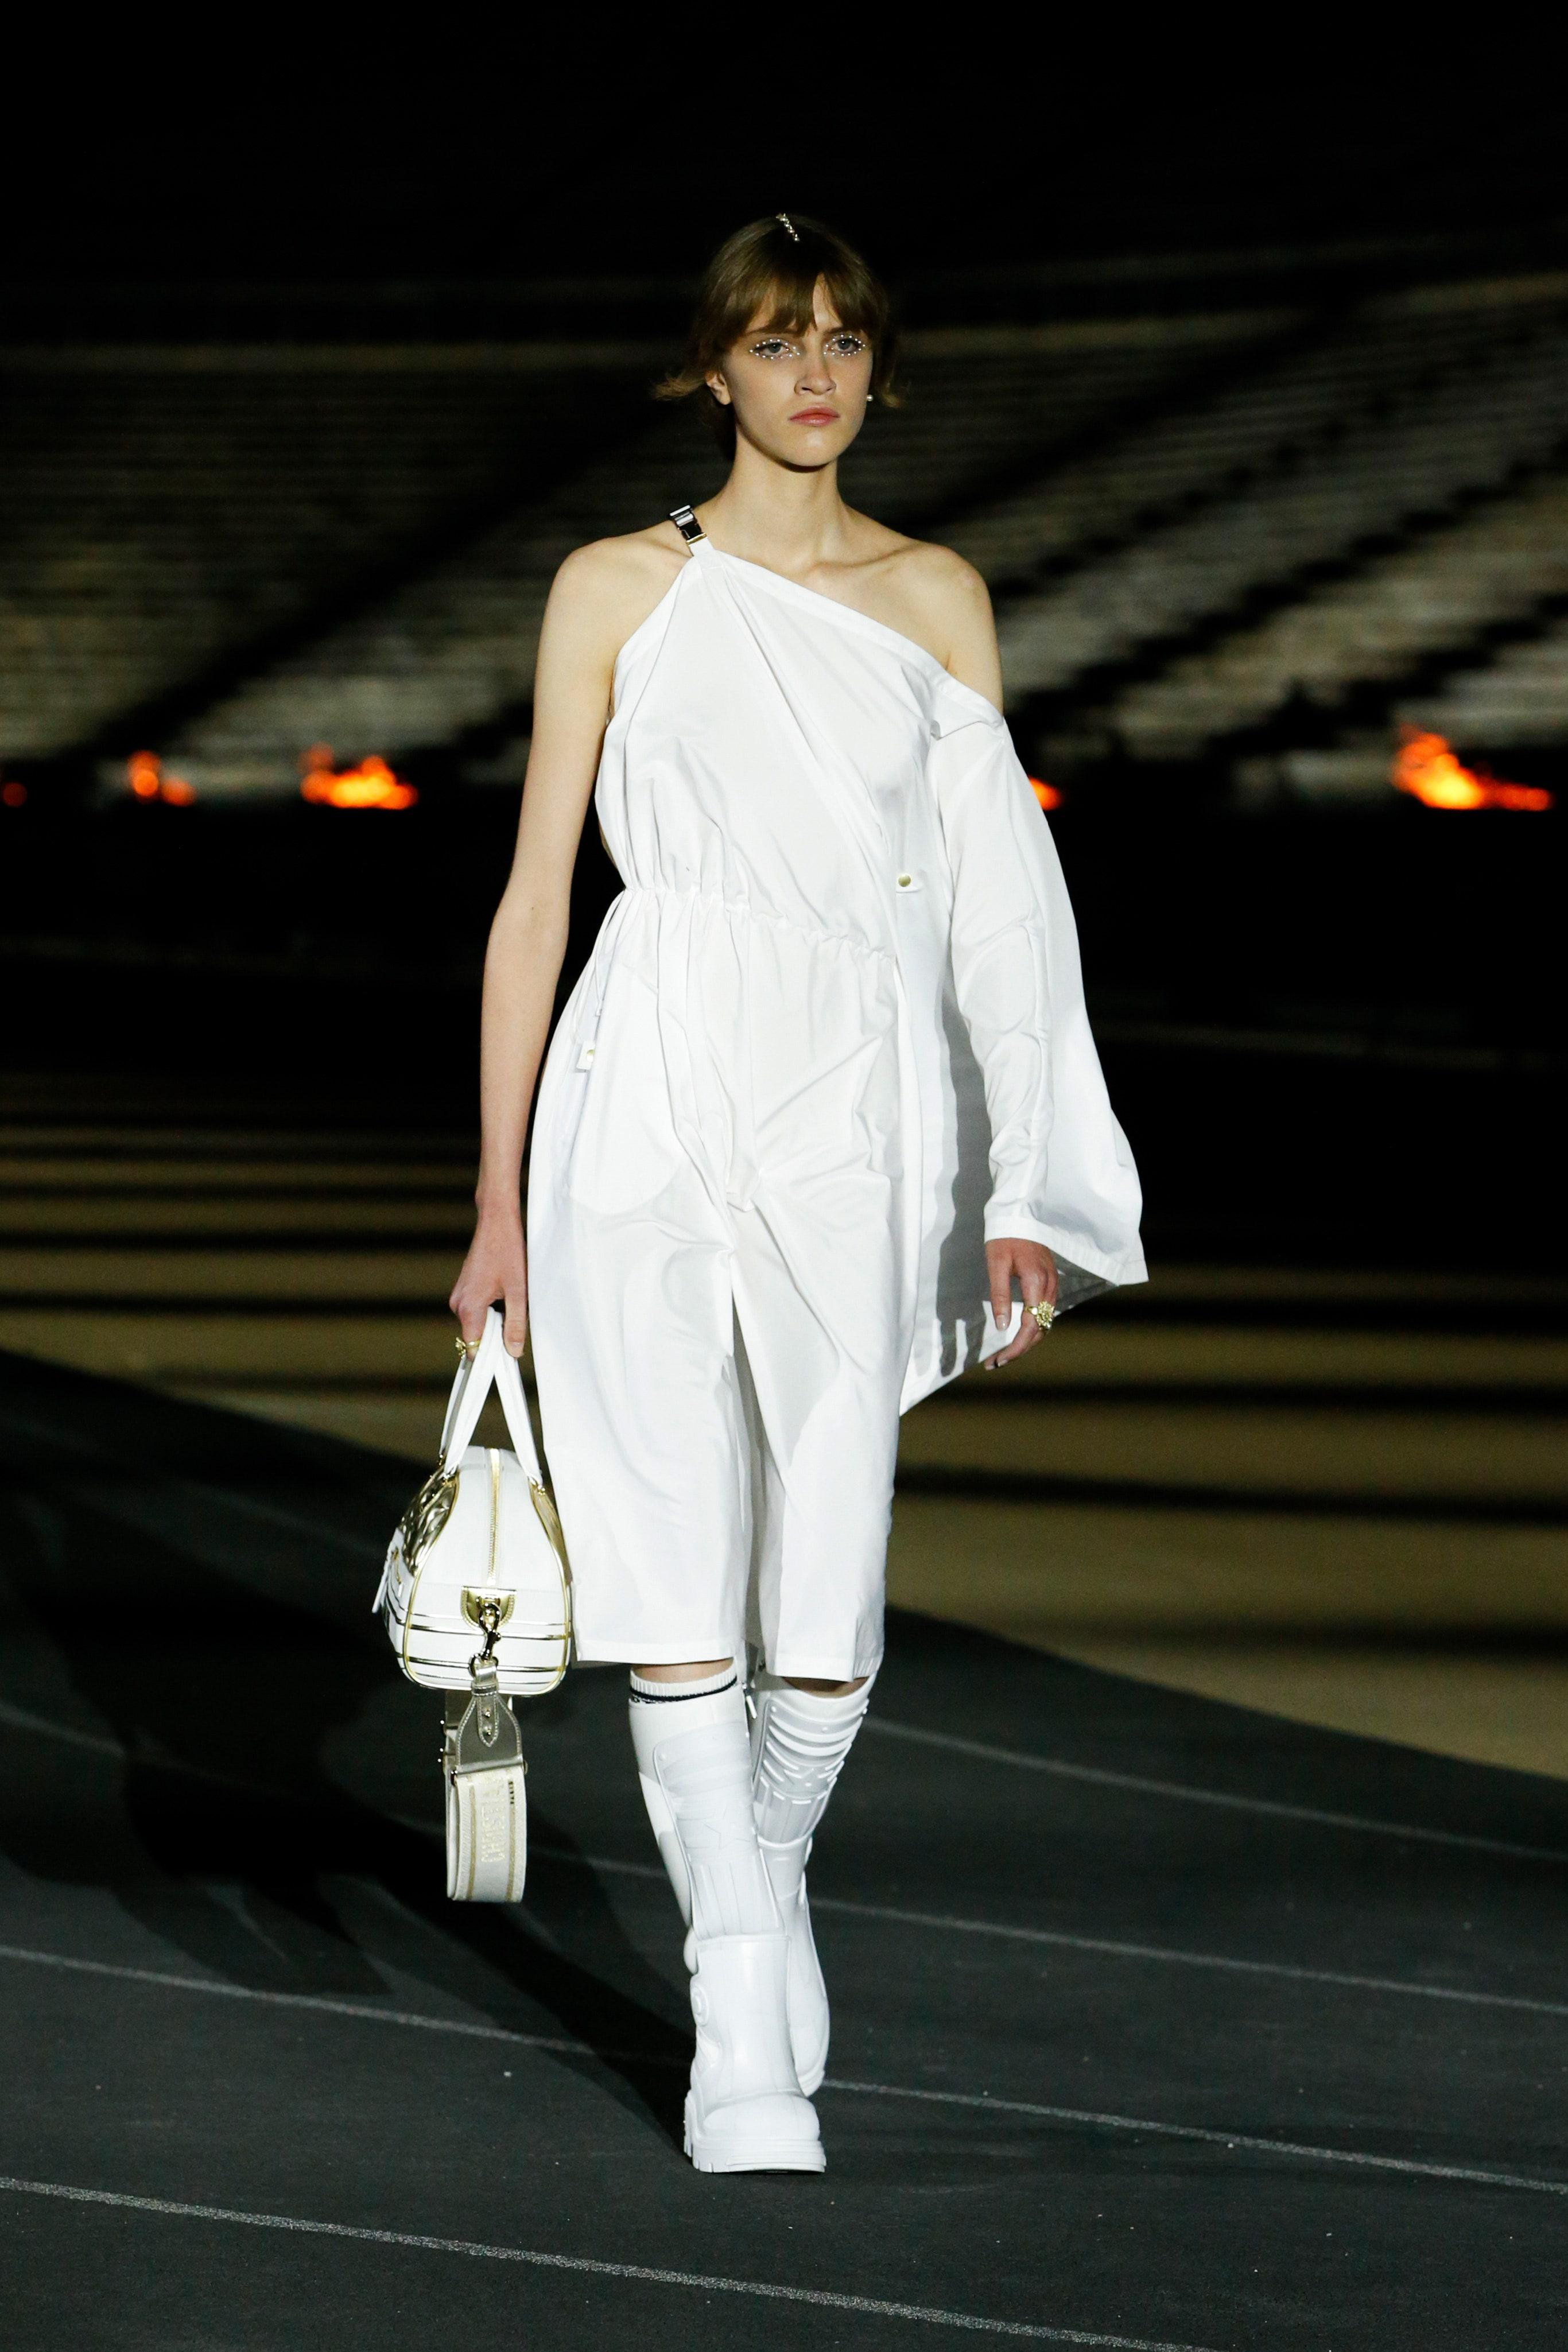 00005-Dior-Resort-2022-credit-brand.jpeg